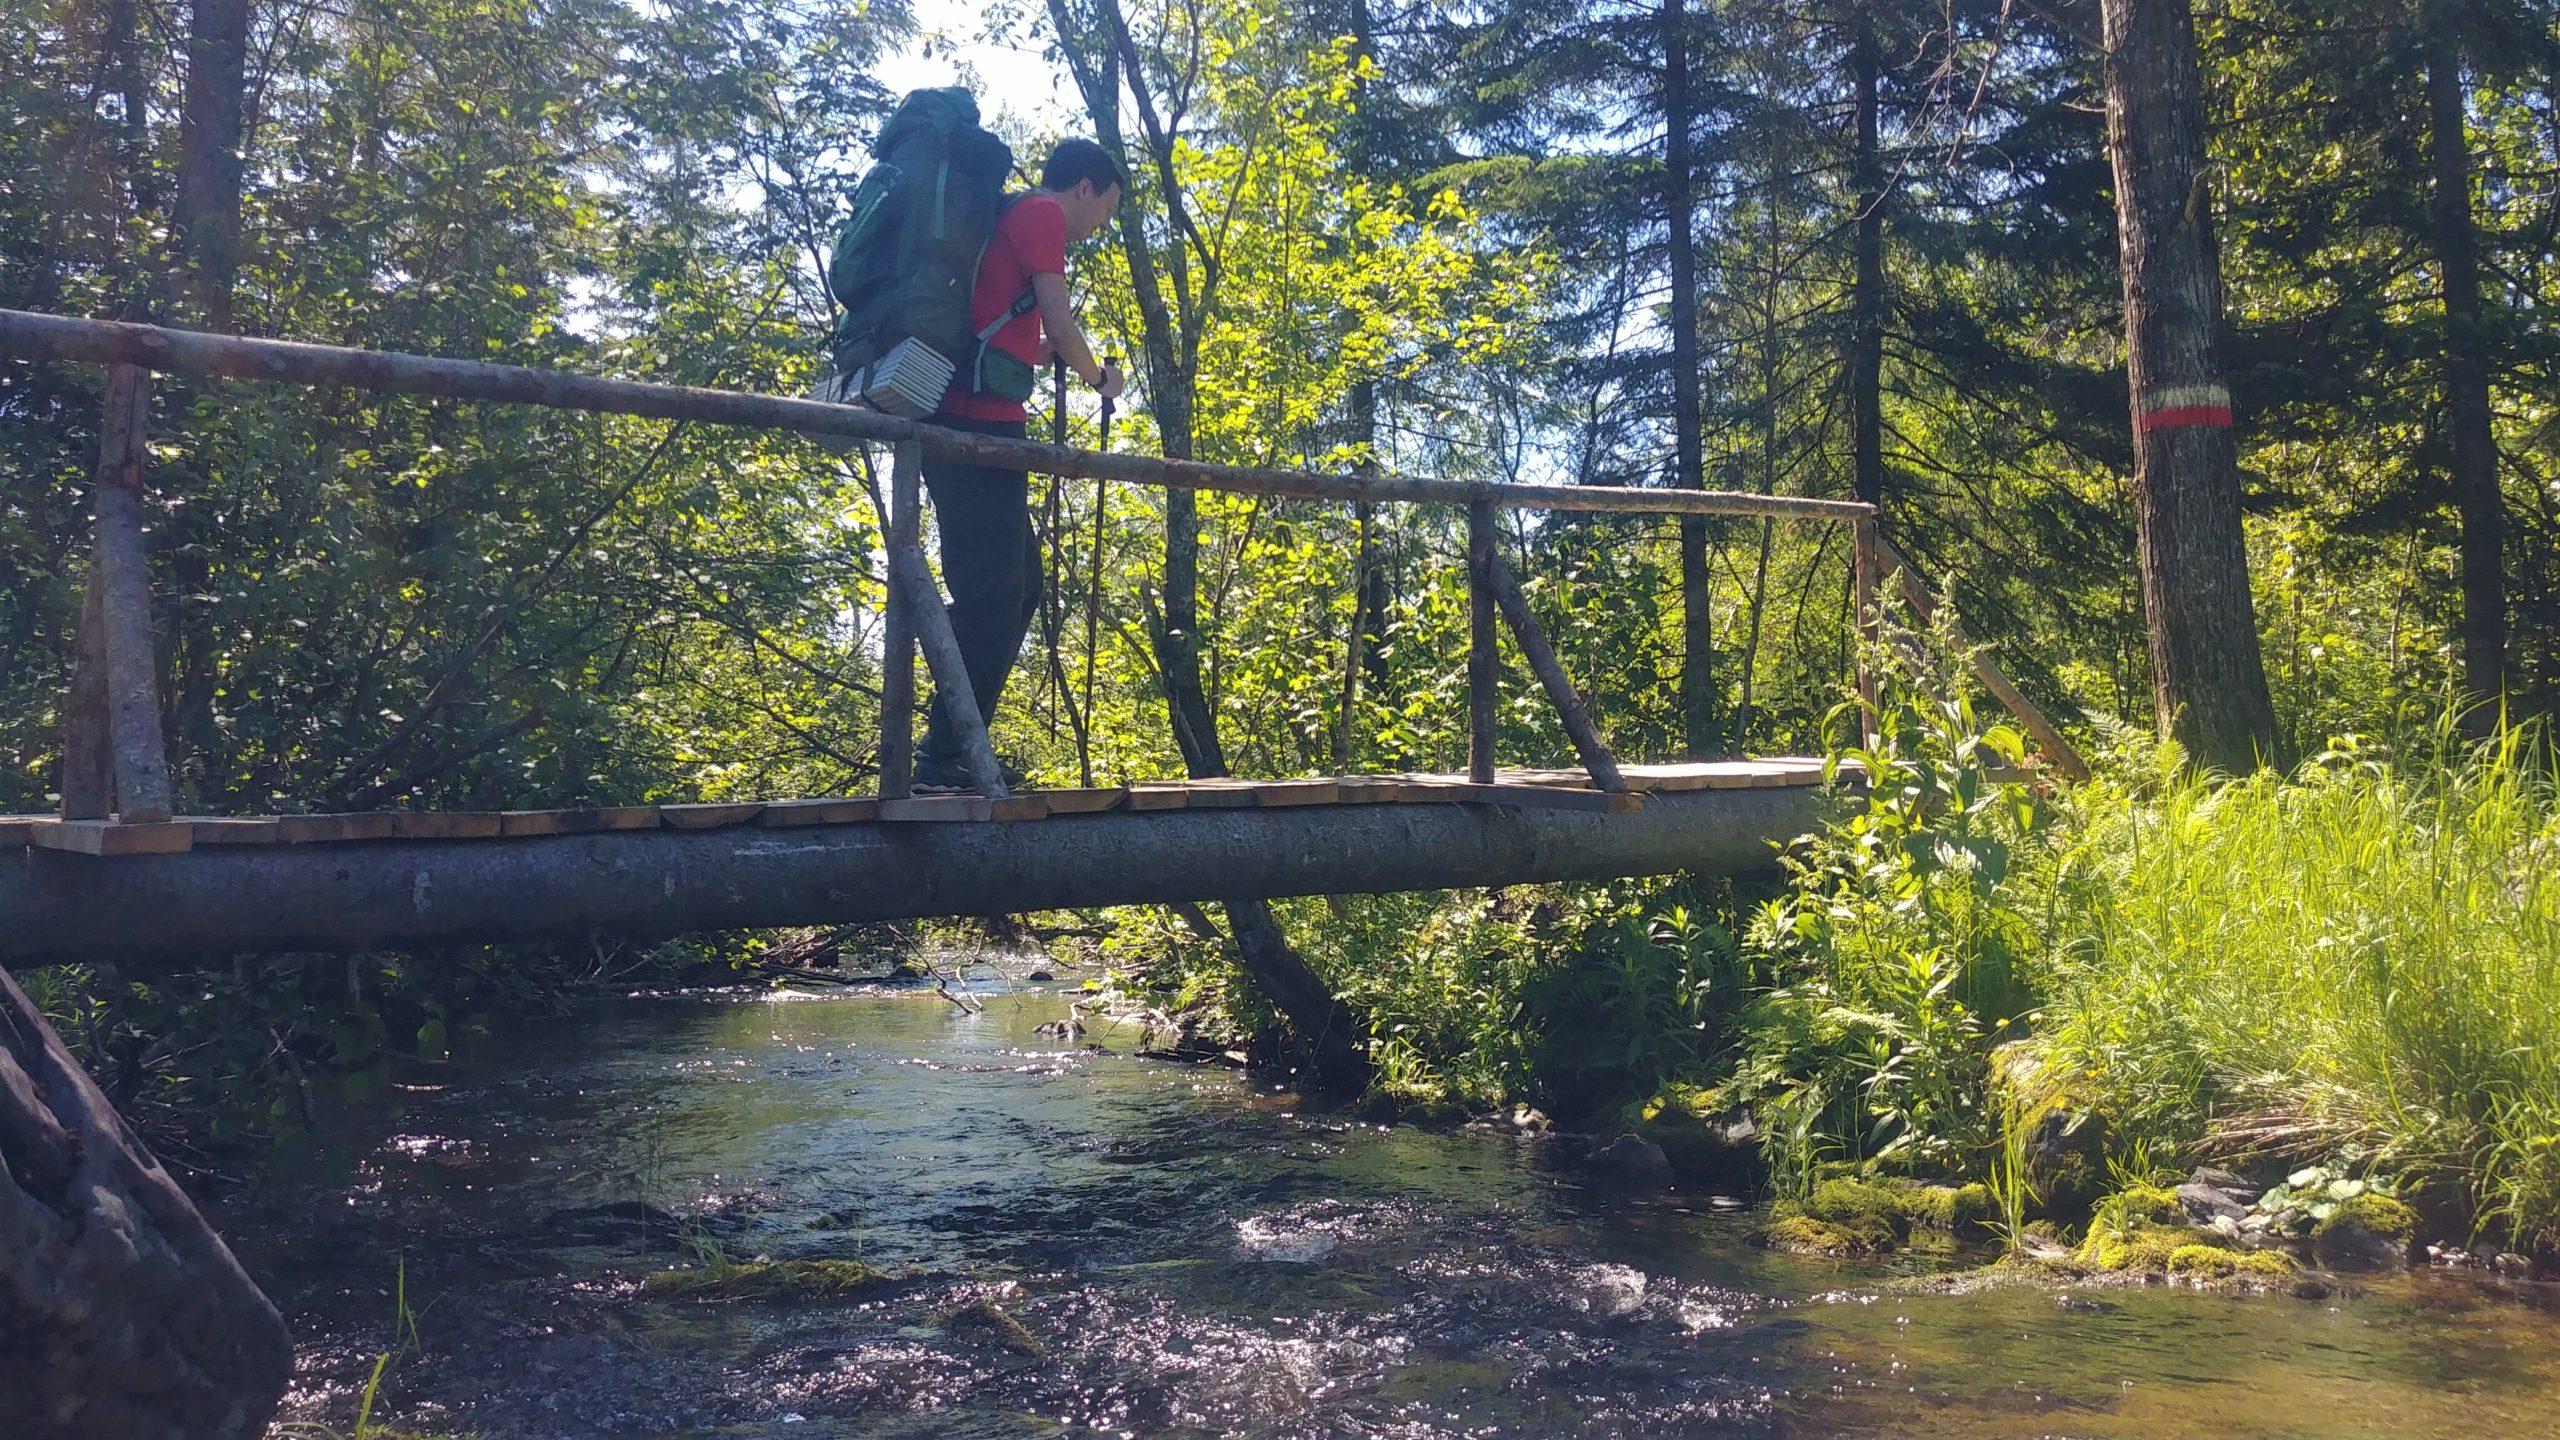 Meruimticook Camp Sisson randonnée nouveau-Brunswick